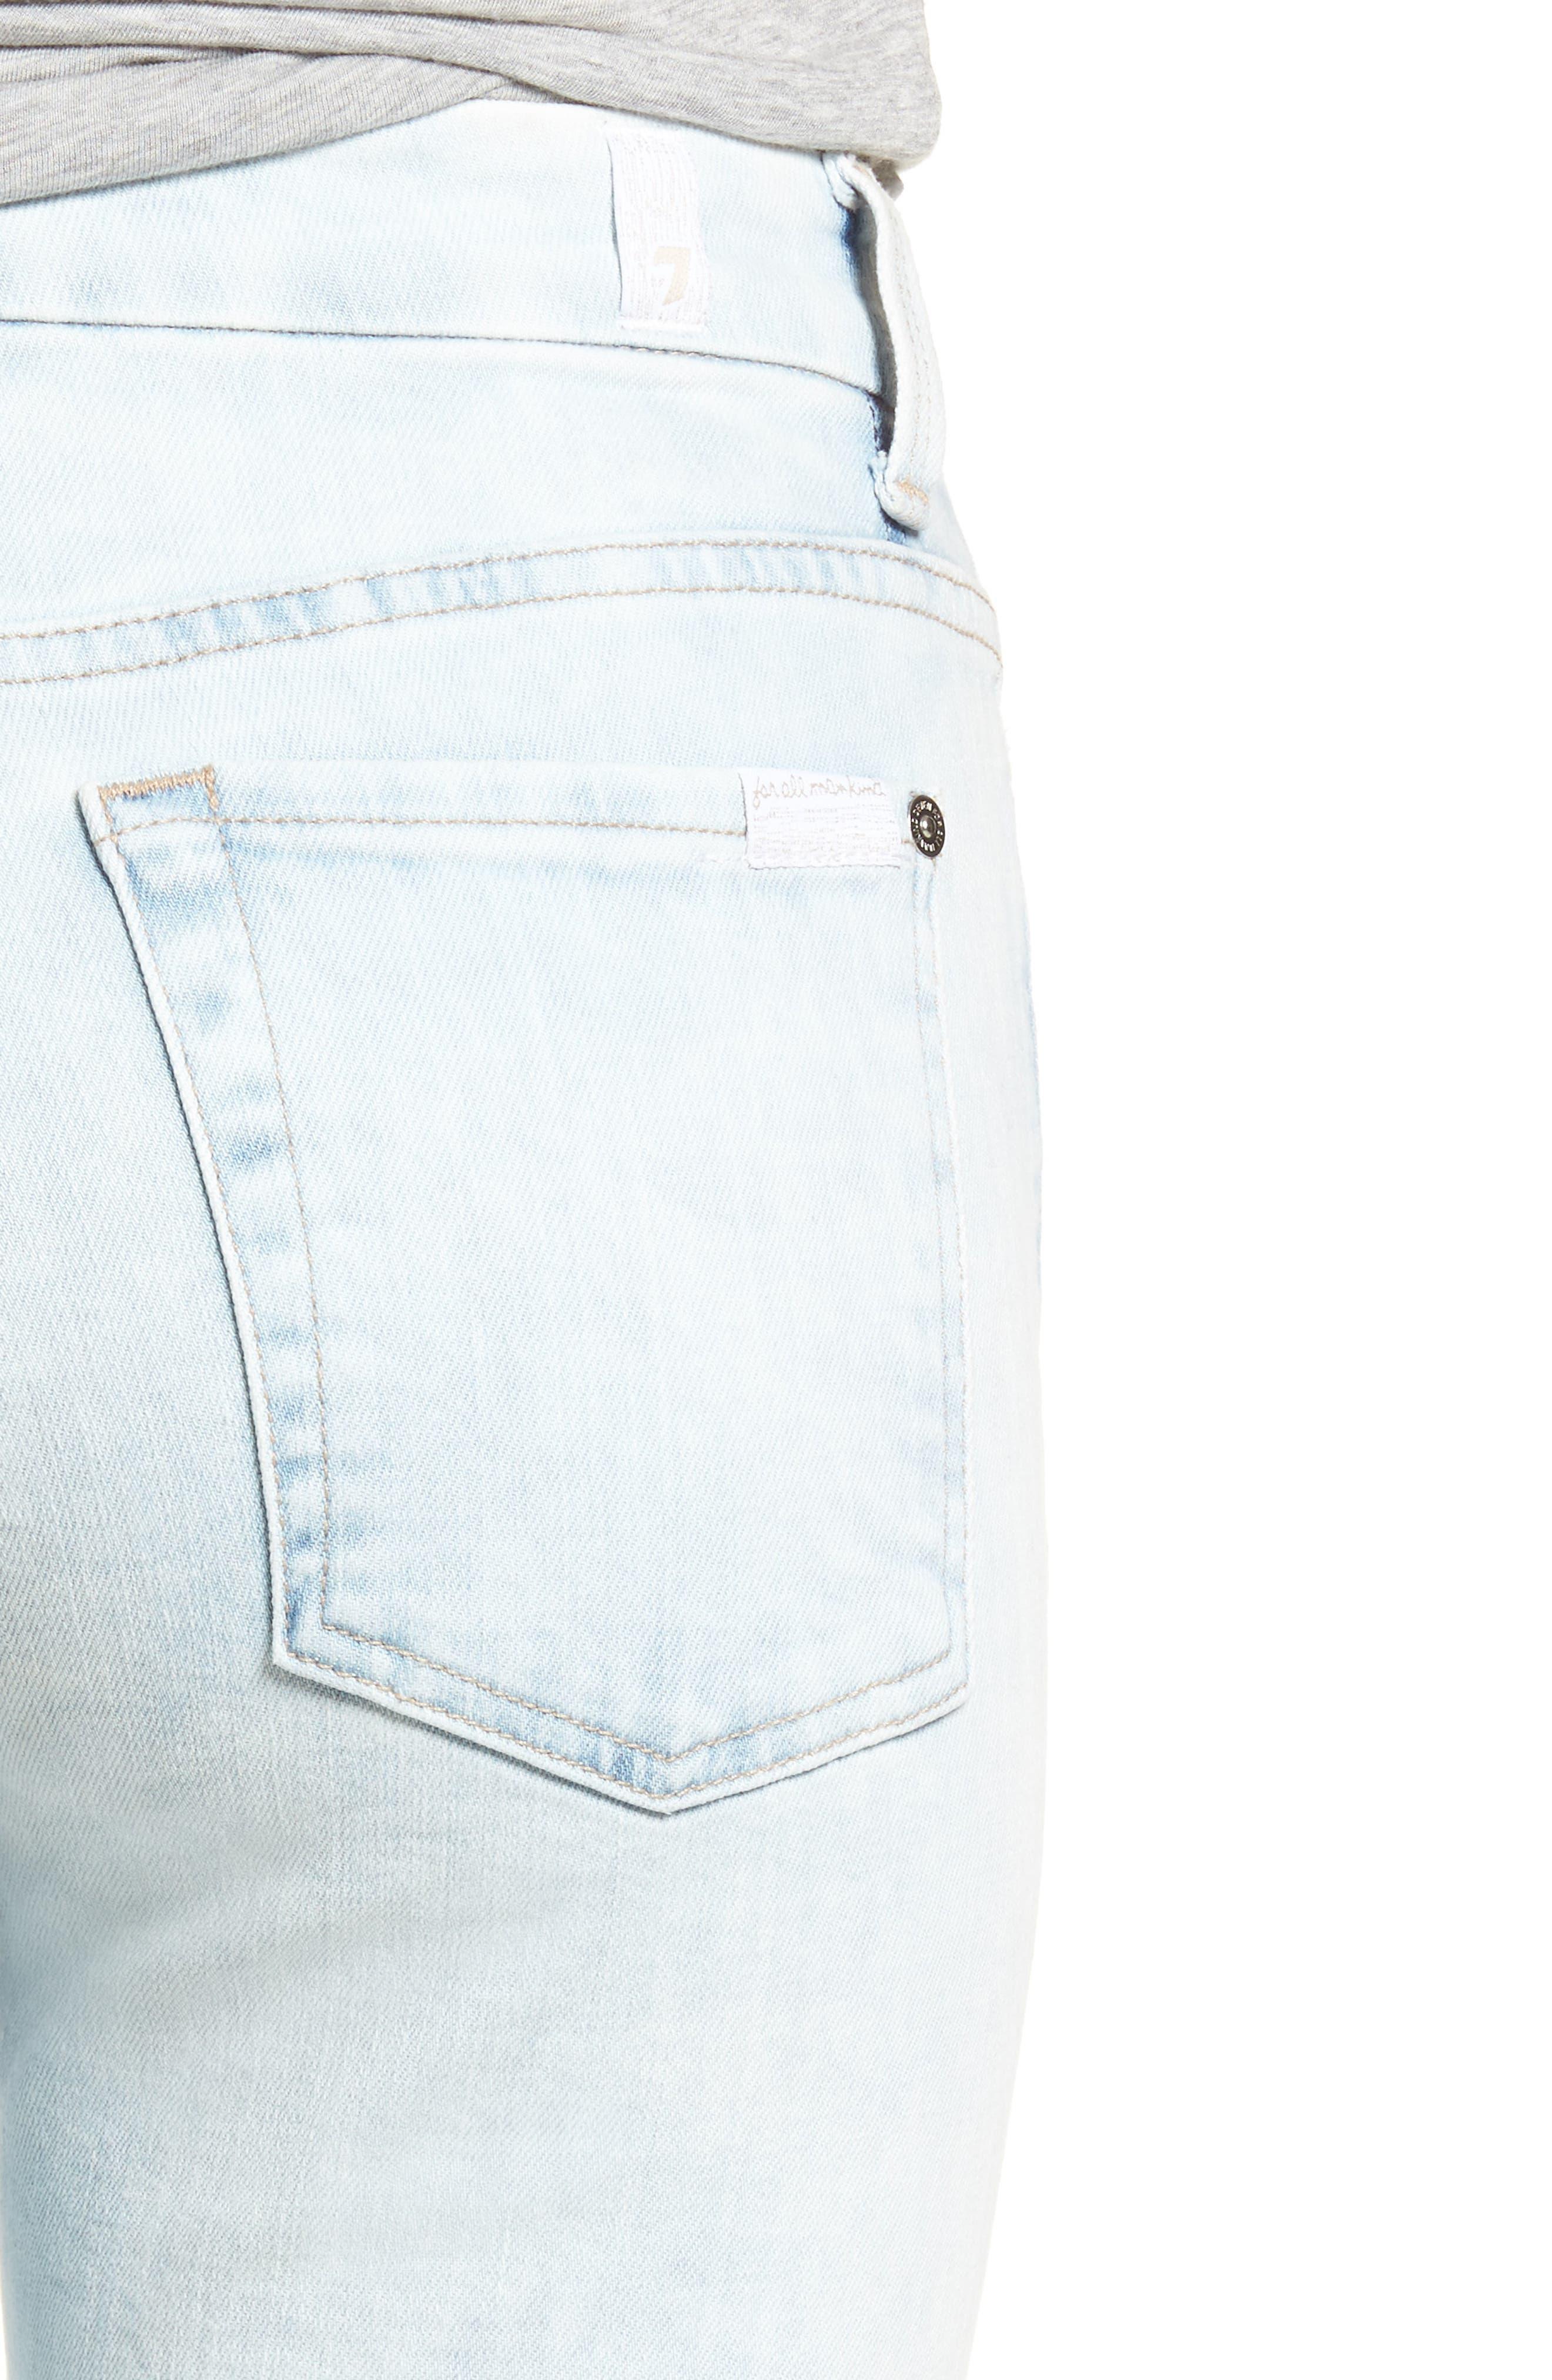 High Waist Ankle Skinny Jeans,                             Alternate thumbnail 4, color,                             401